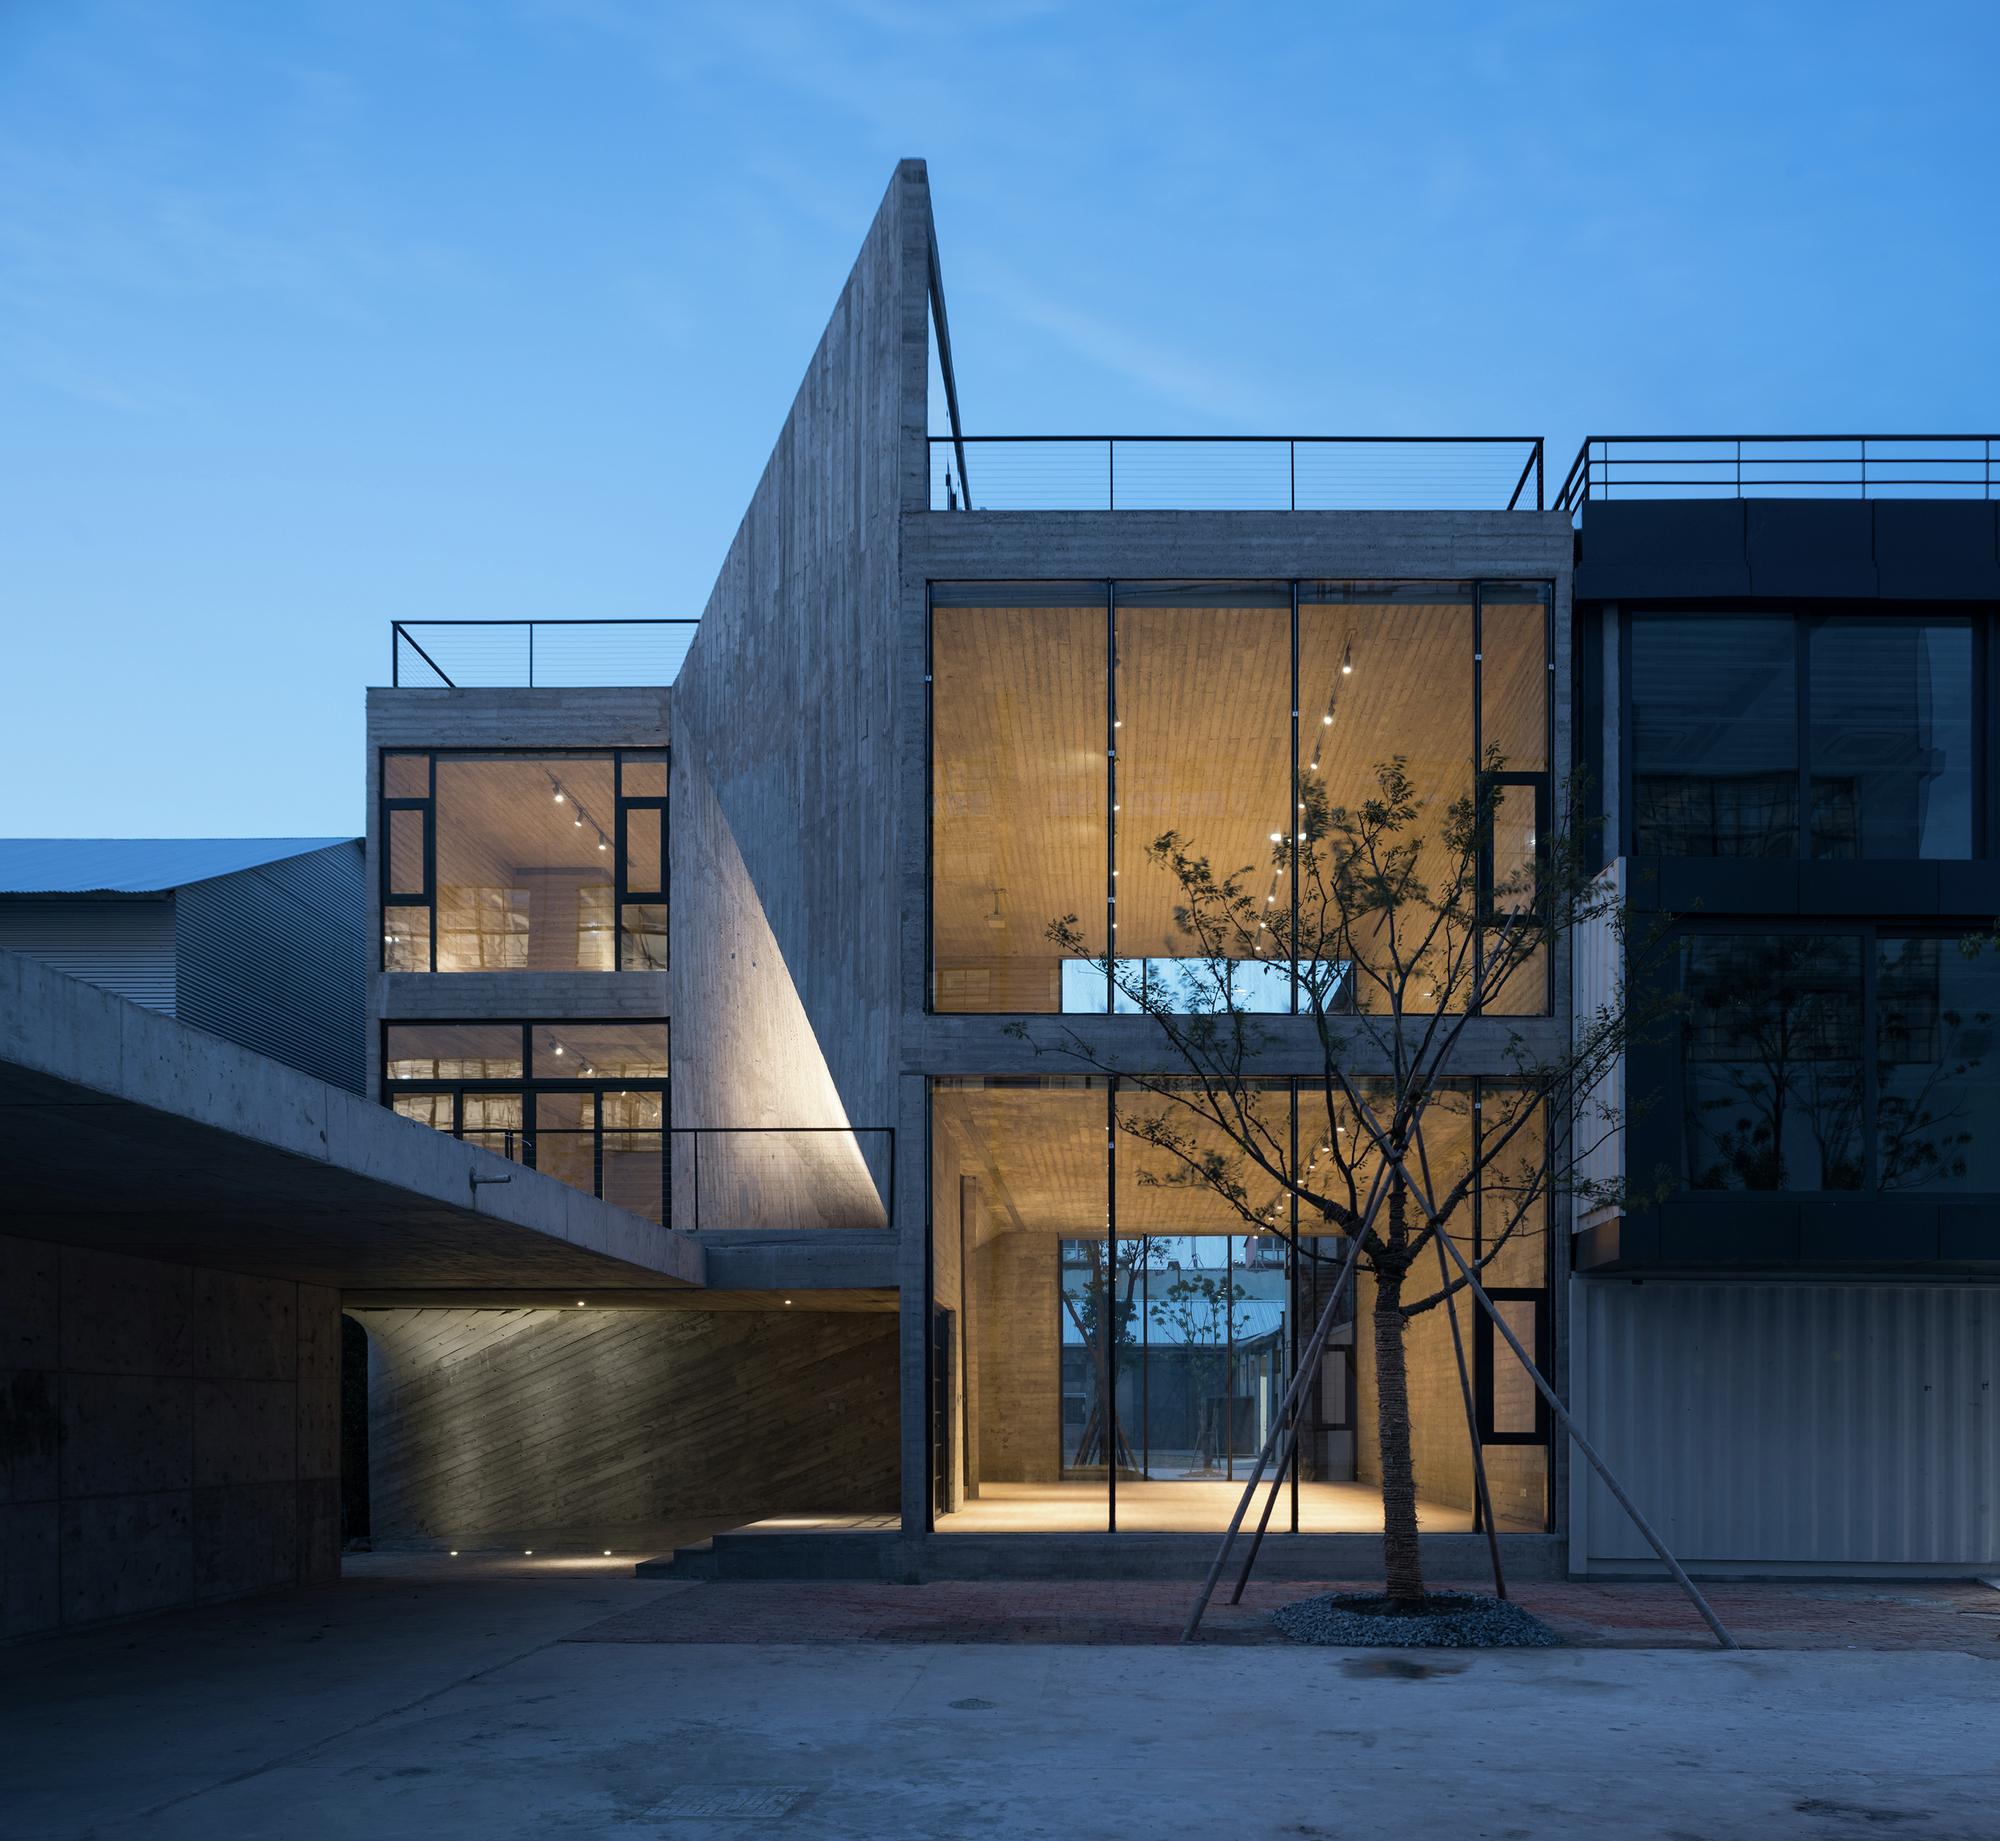 Fab-Union Space / Archi-Union Architects